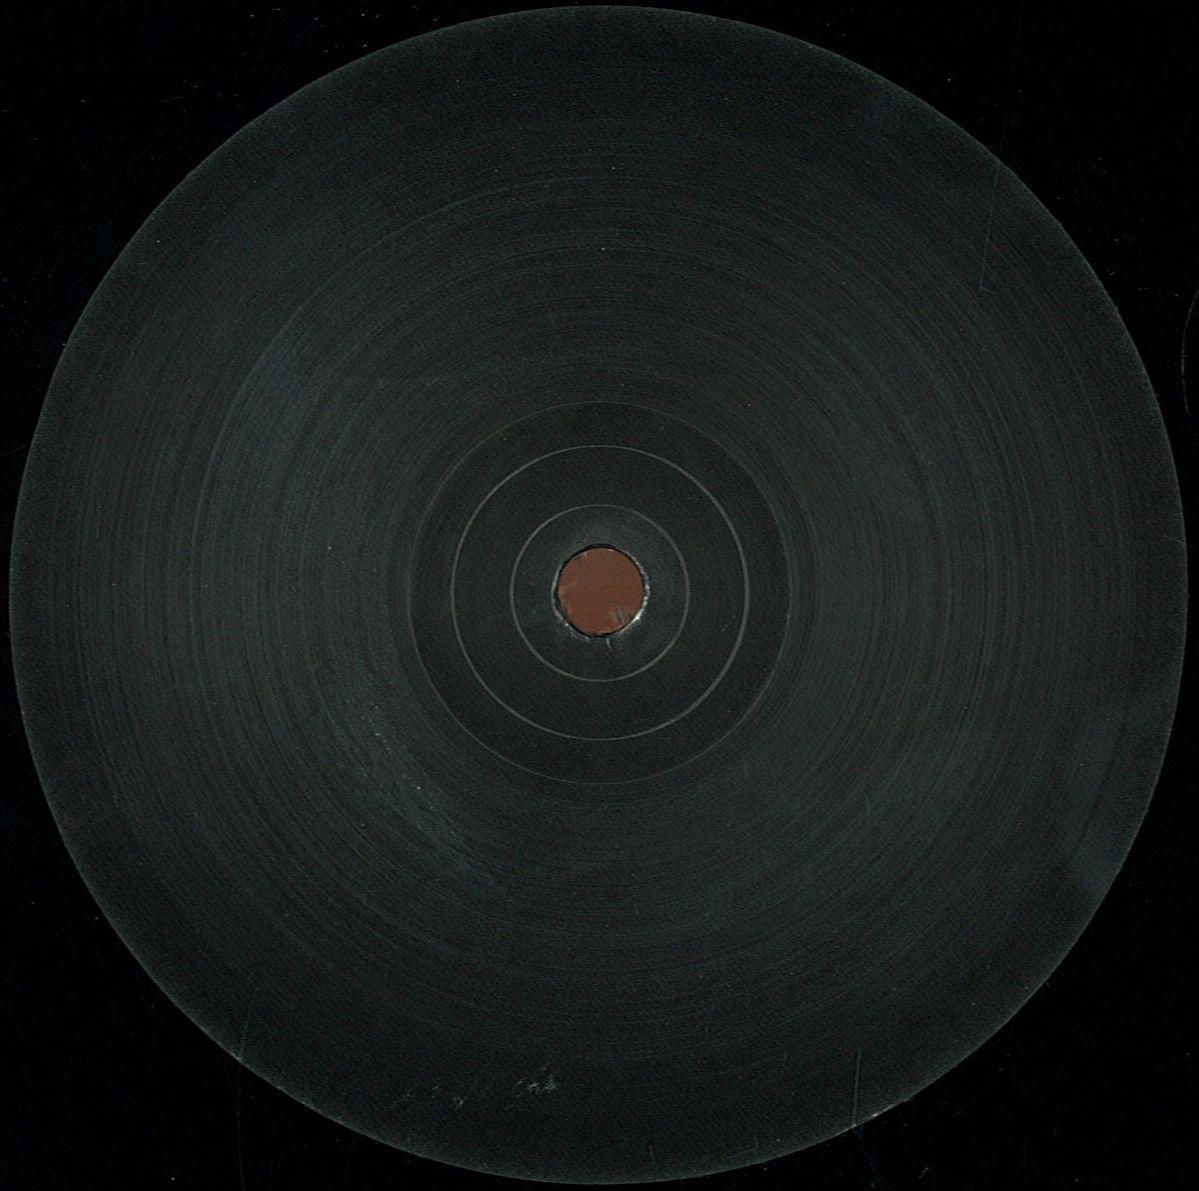 garrix martin animals aaa recordings vinyl record